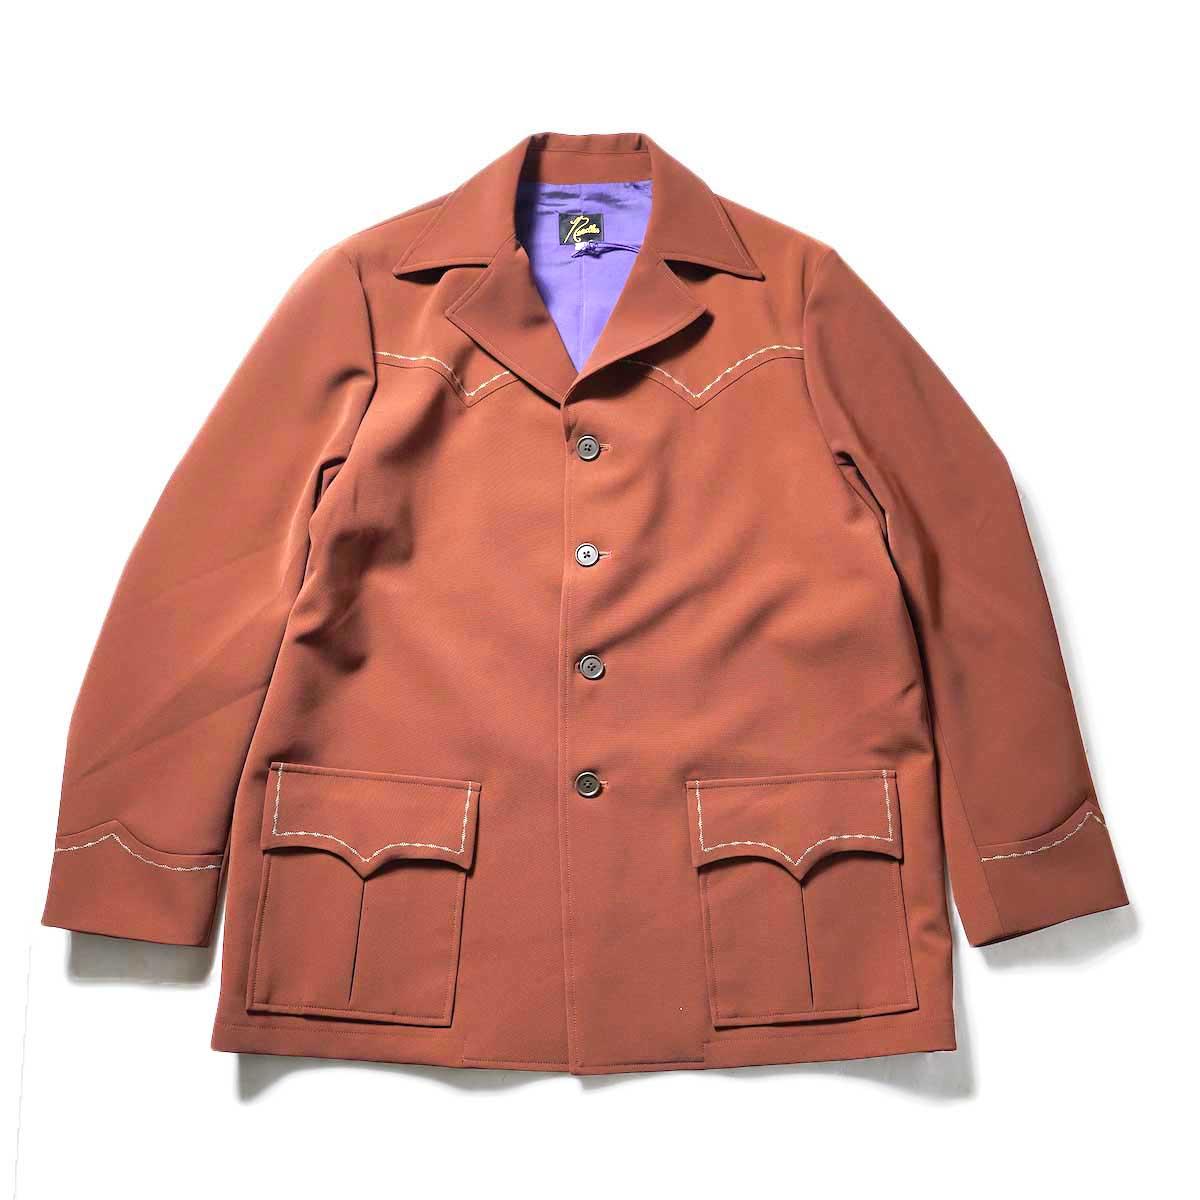 Needles / WESTERN LEISURE JACKET - PE/PU DOUBLE CLOTH (Brick)